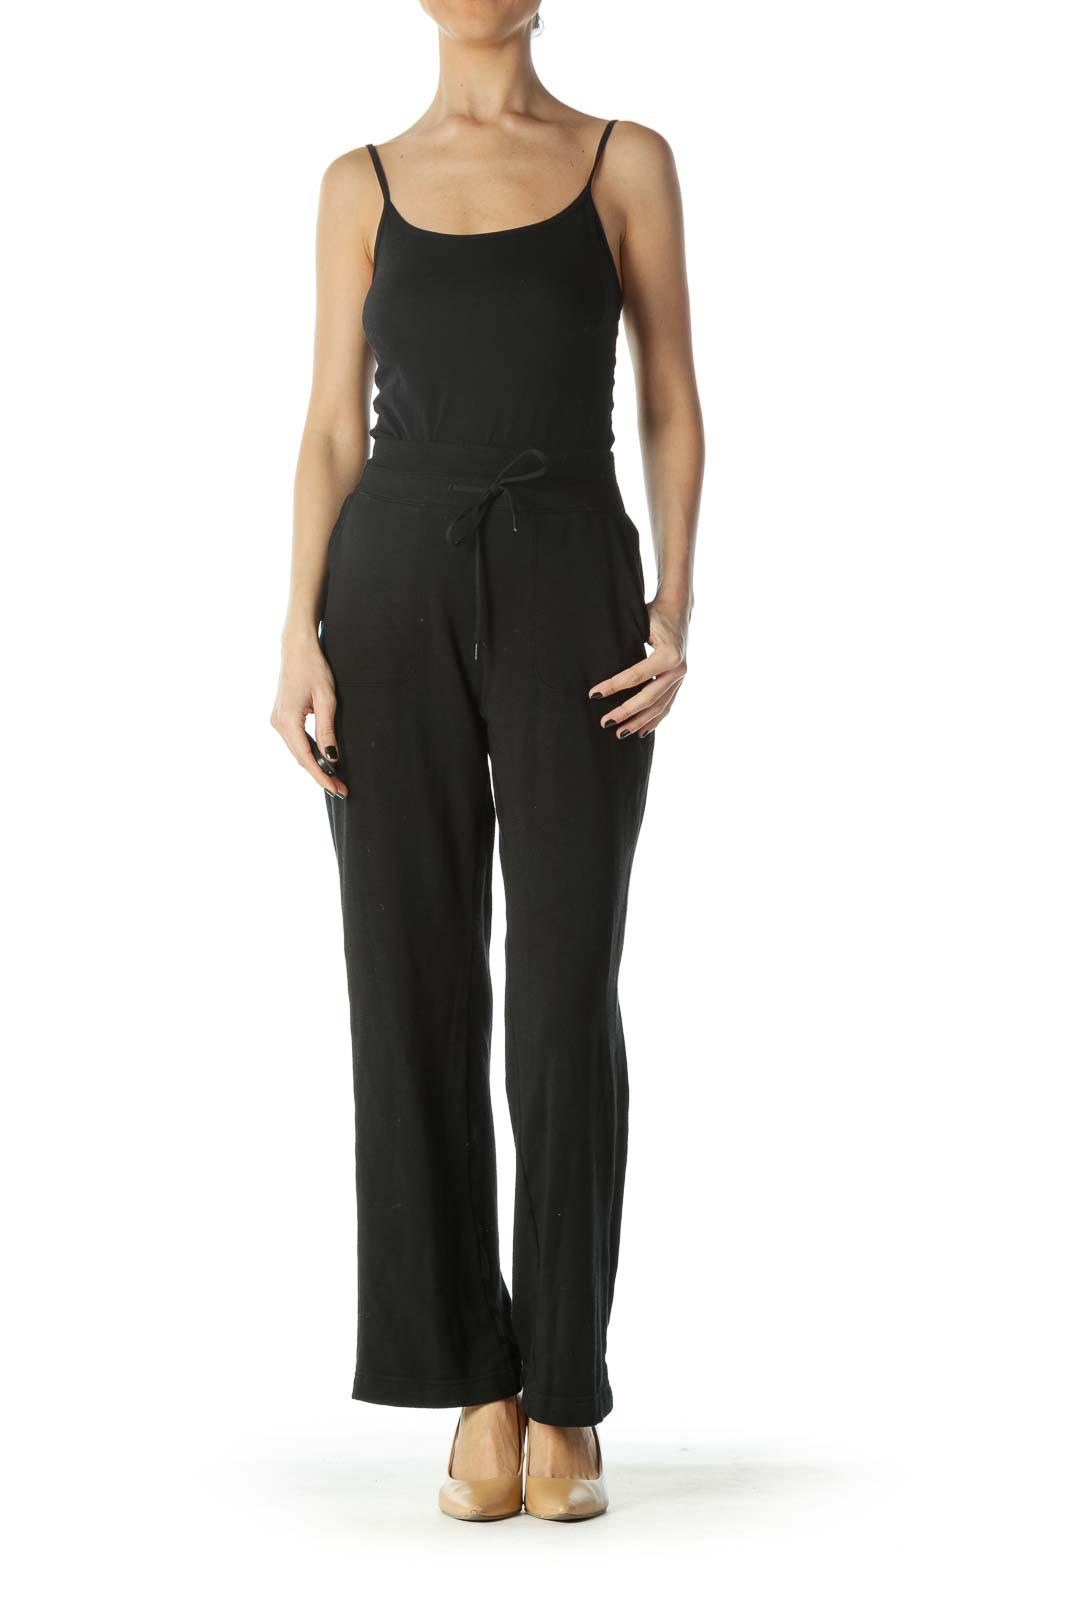 Black Stretch Light Sports Pants with Drawstring